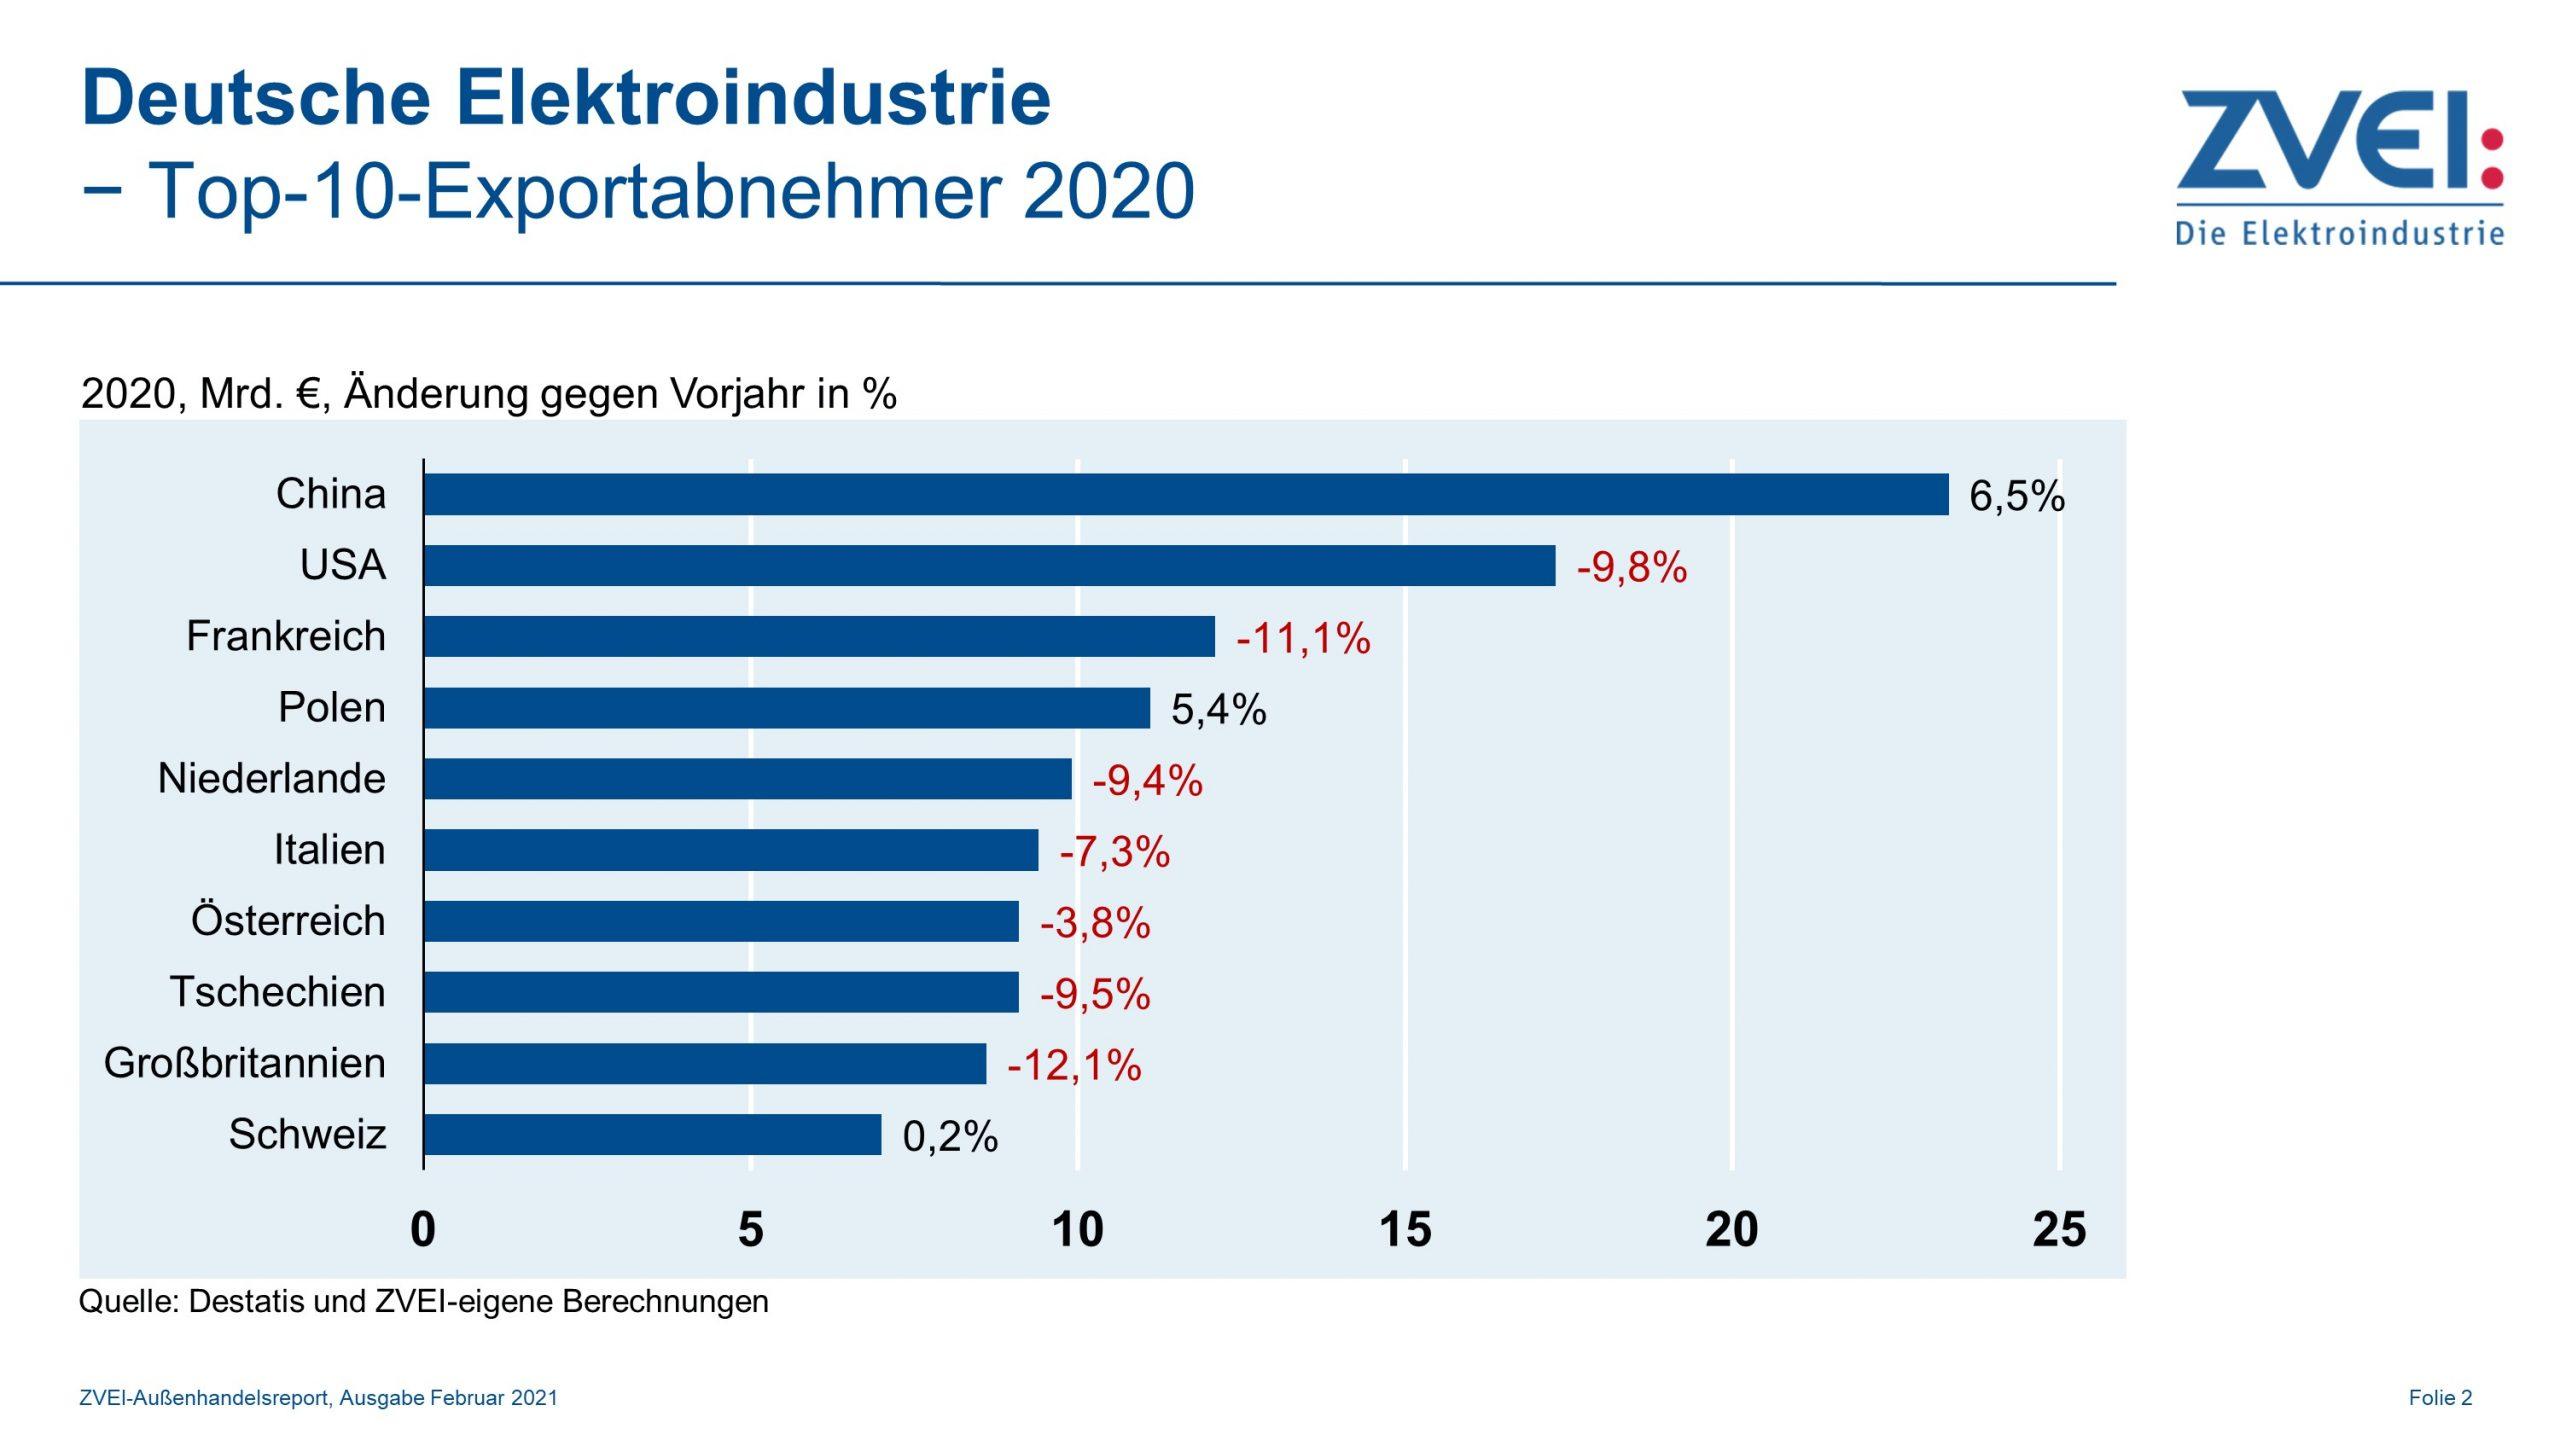 Deutsche Elektroindustrie: Top10-Exportabnehmer 2020